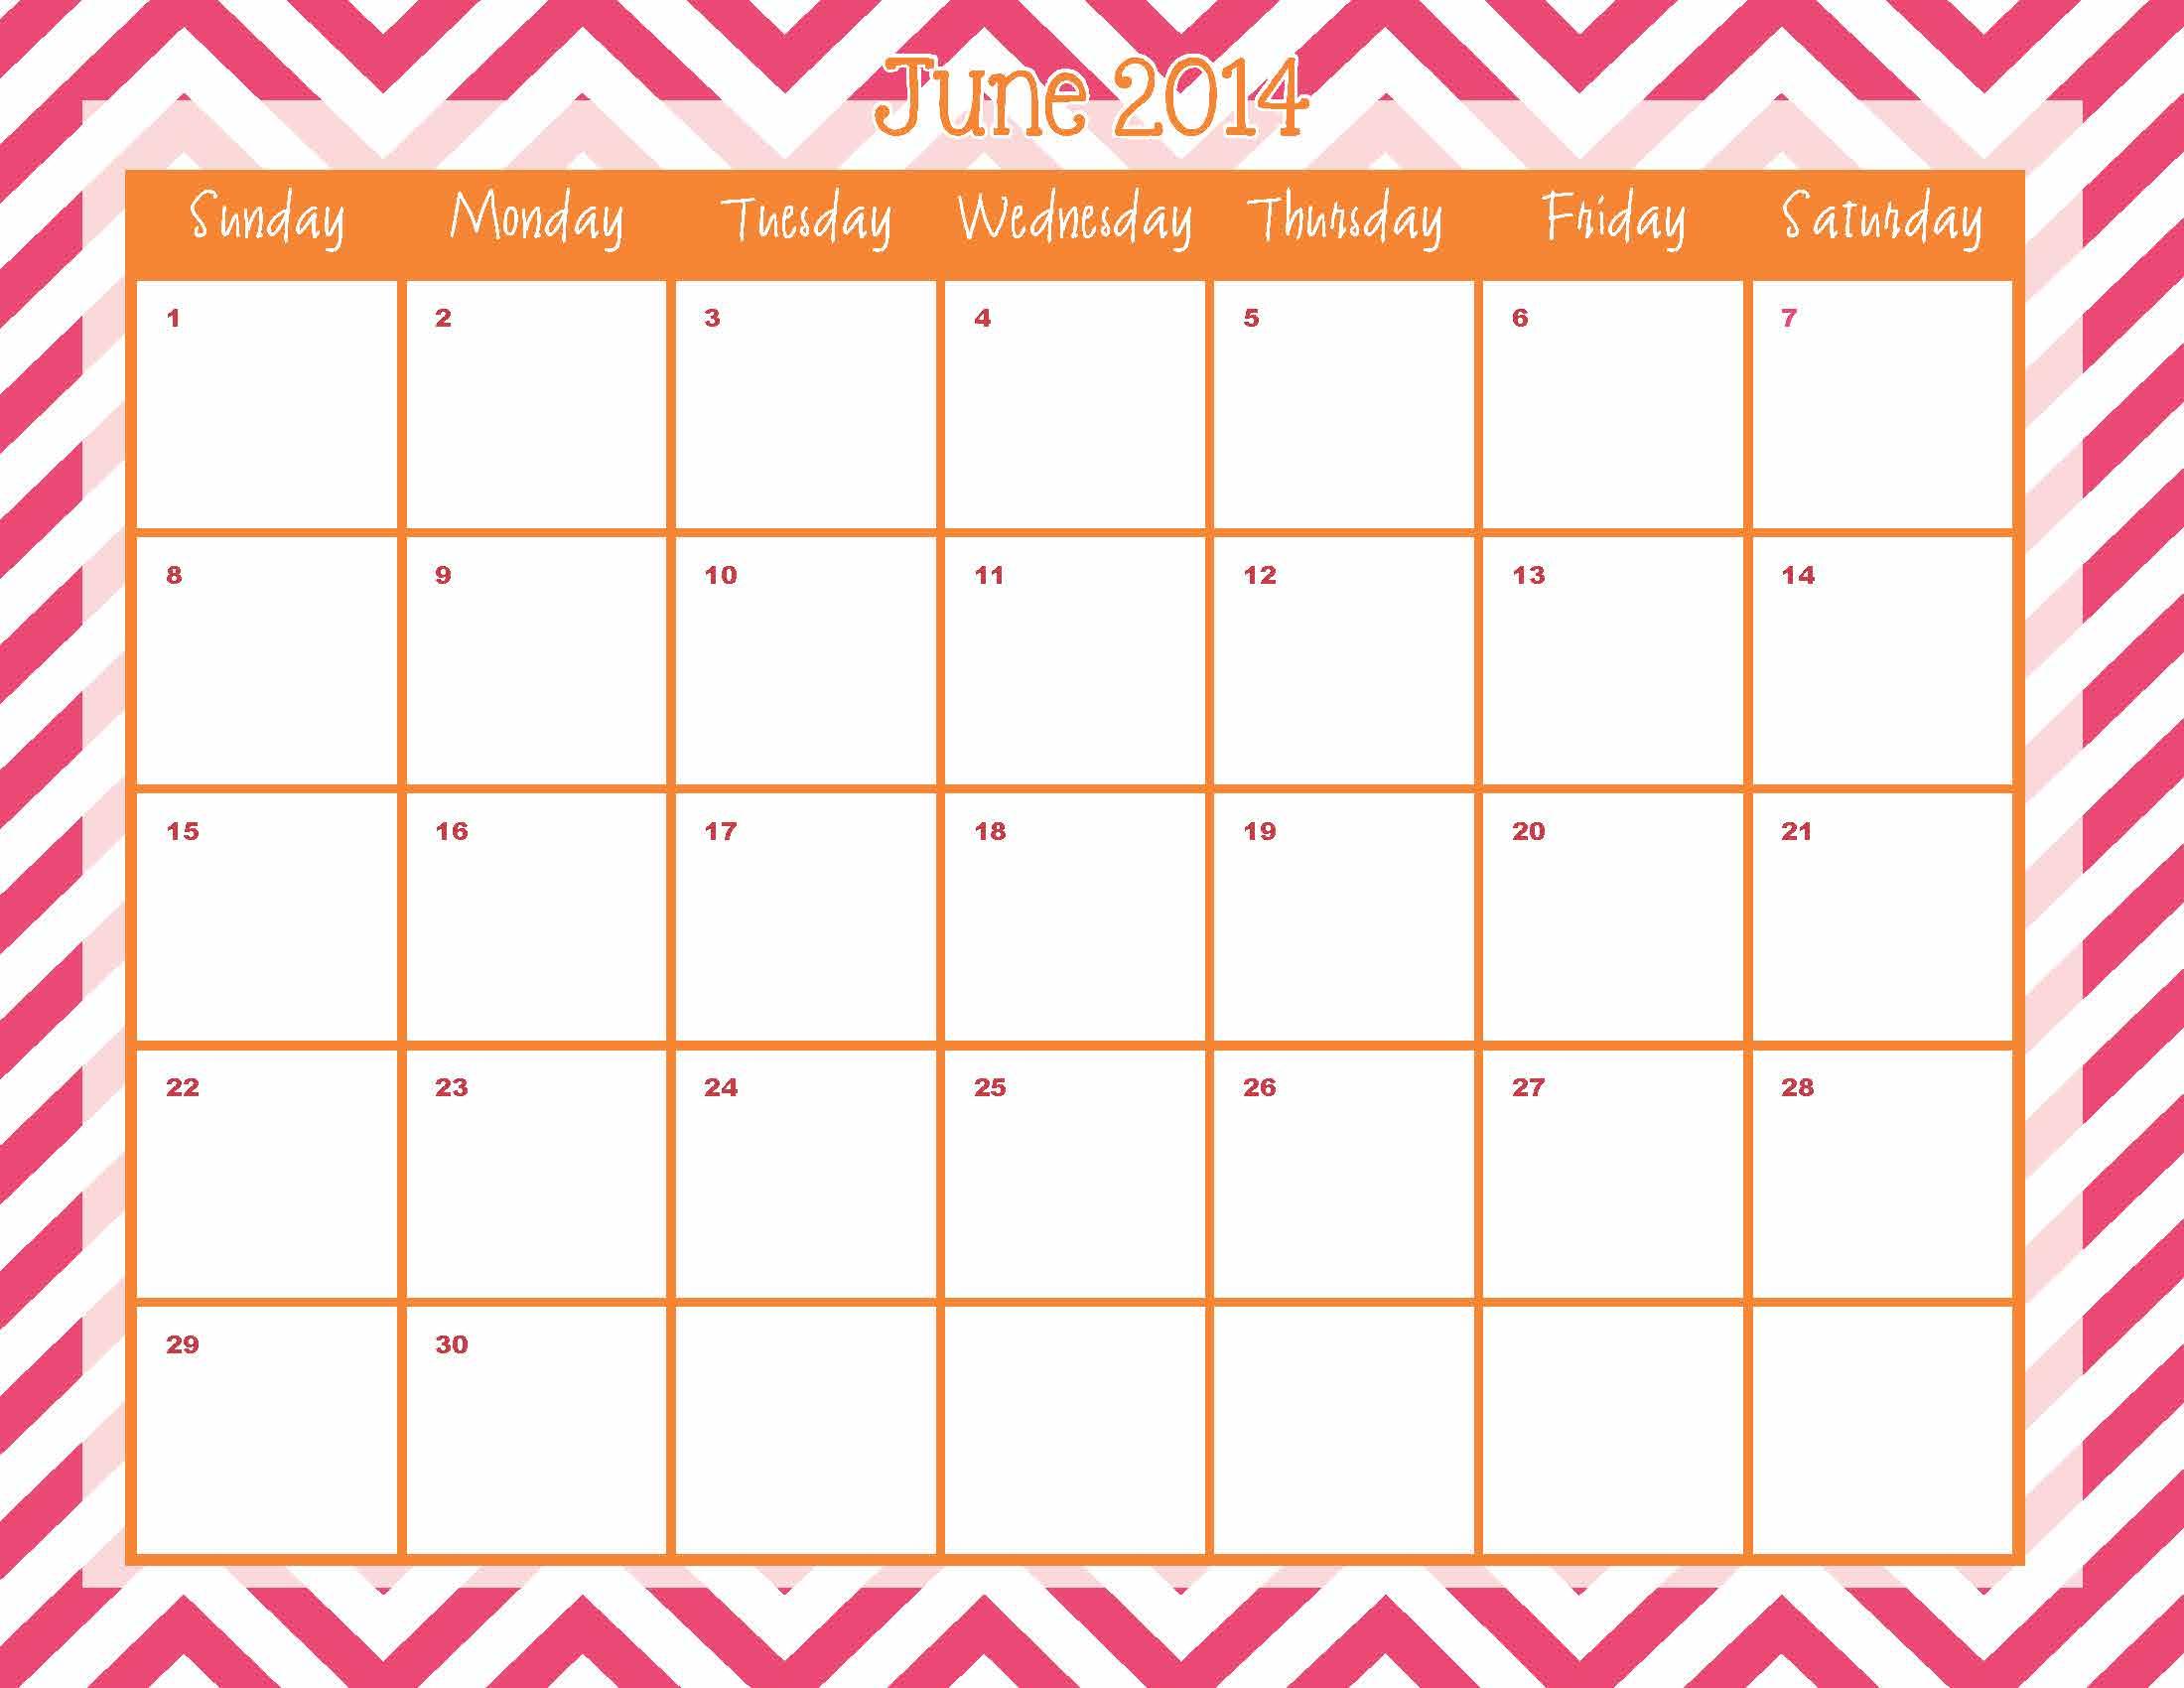 Simple & Savvy Designs | Blog in Calendar Ng Manok Panabong